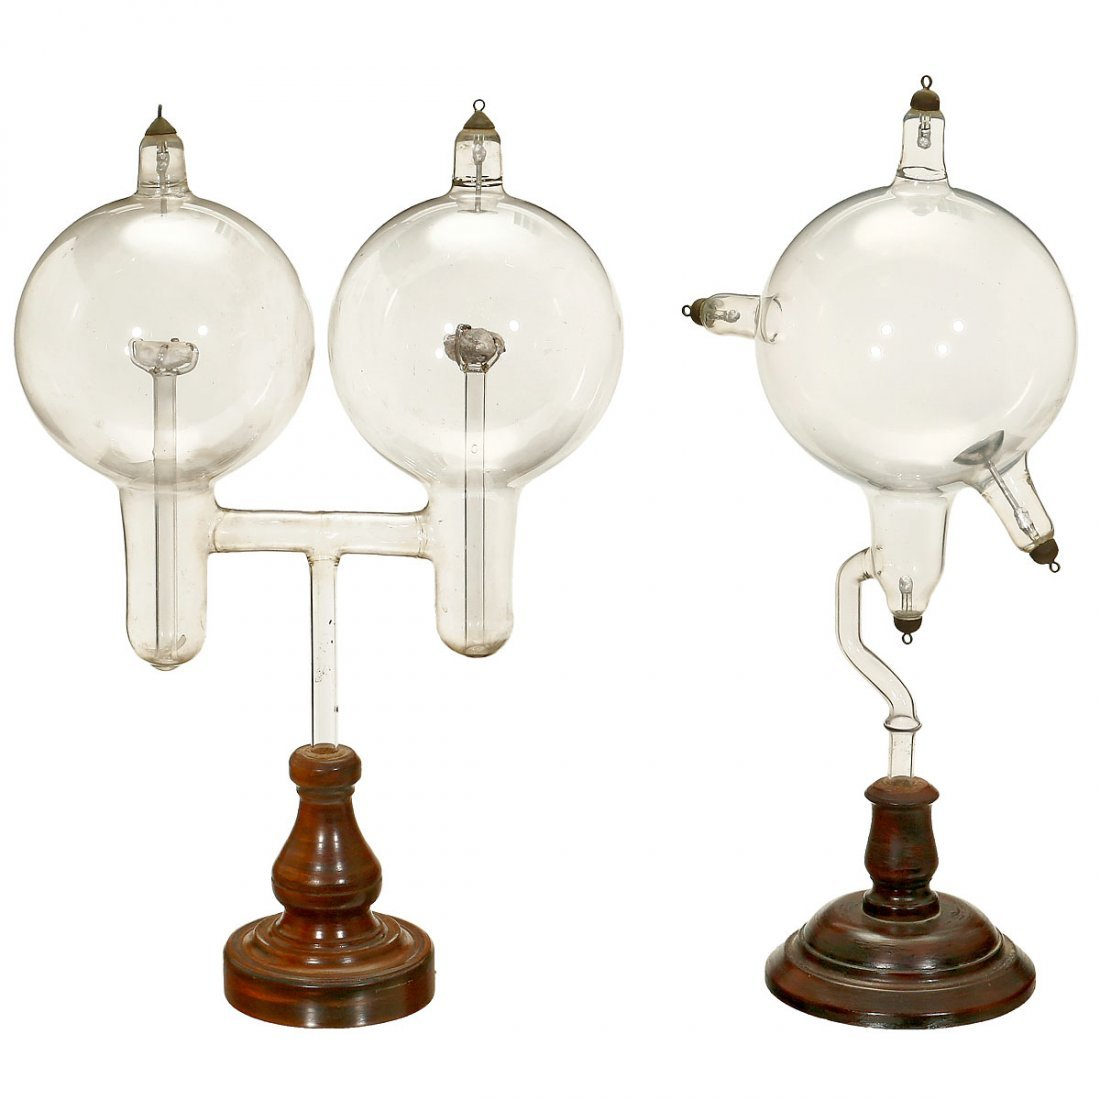 2 Physical Demonstration Models, c. 1910